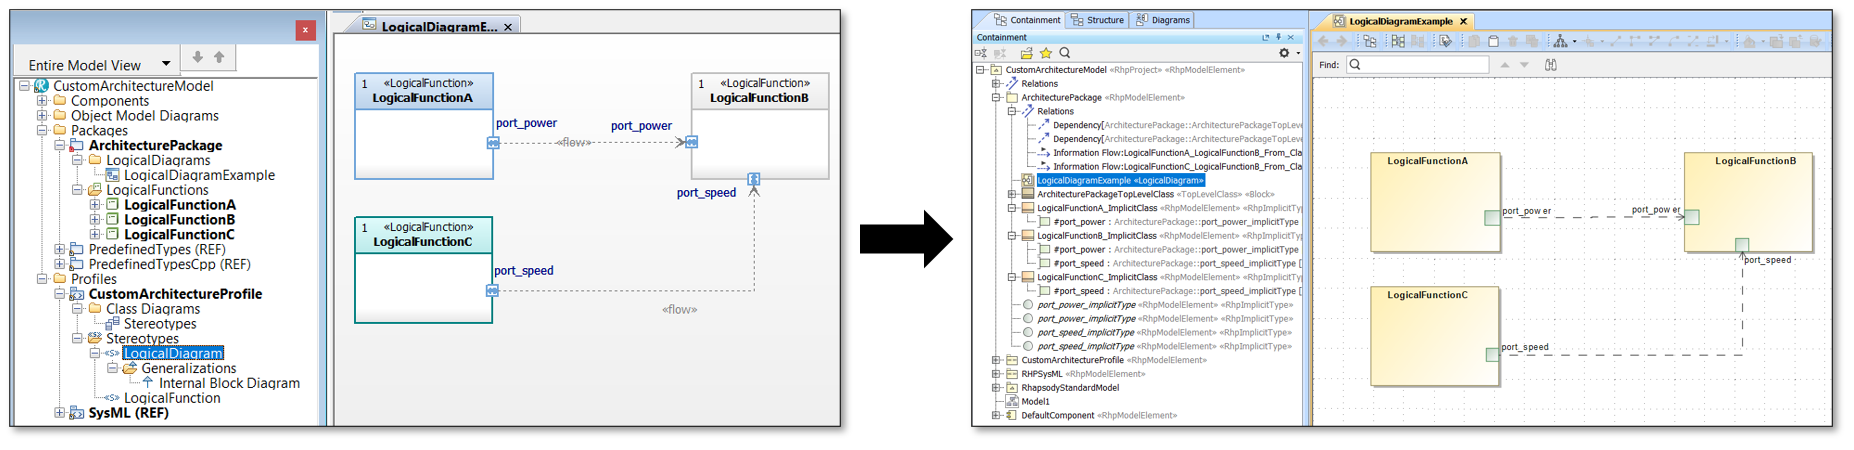 Diagram enhancements_Publisher for Rhapsody 2.5.0 release_SodiusWillert